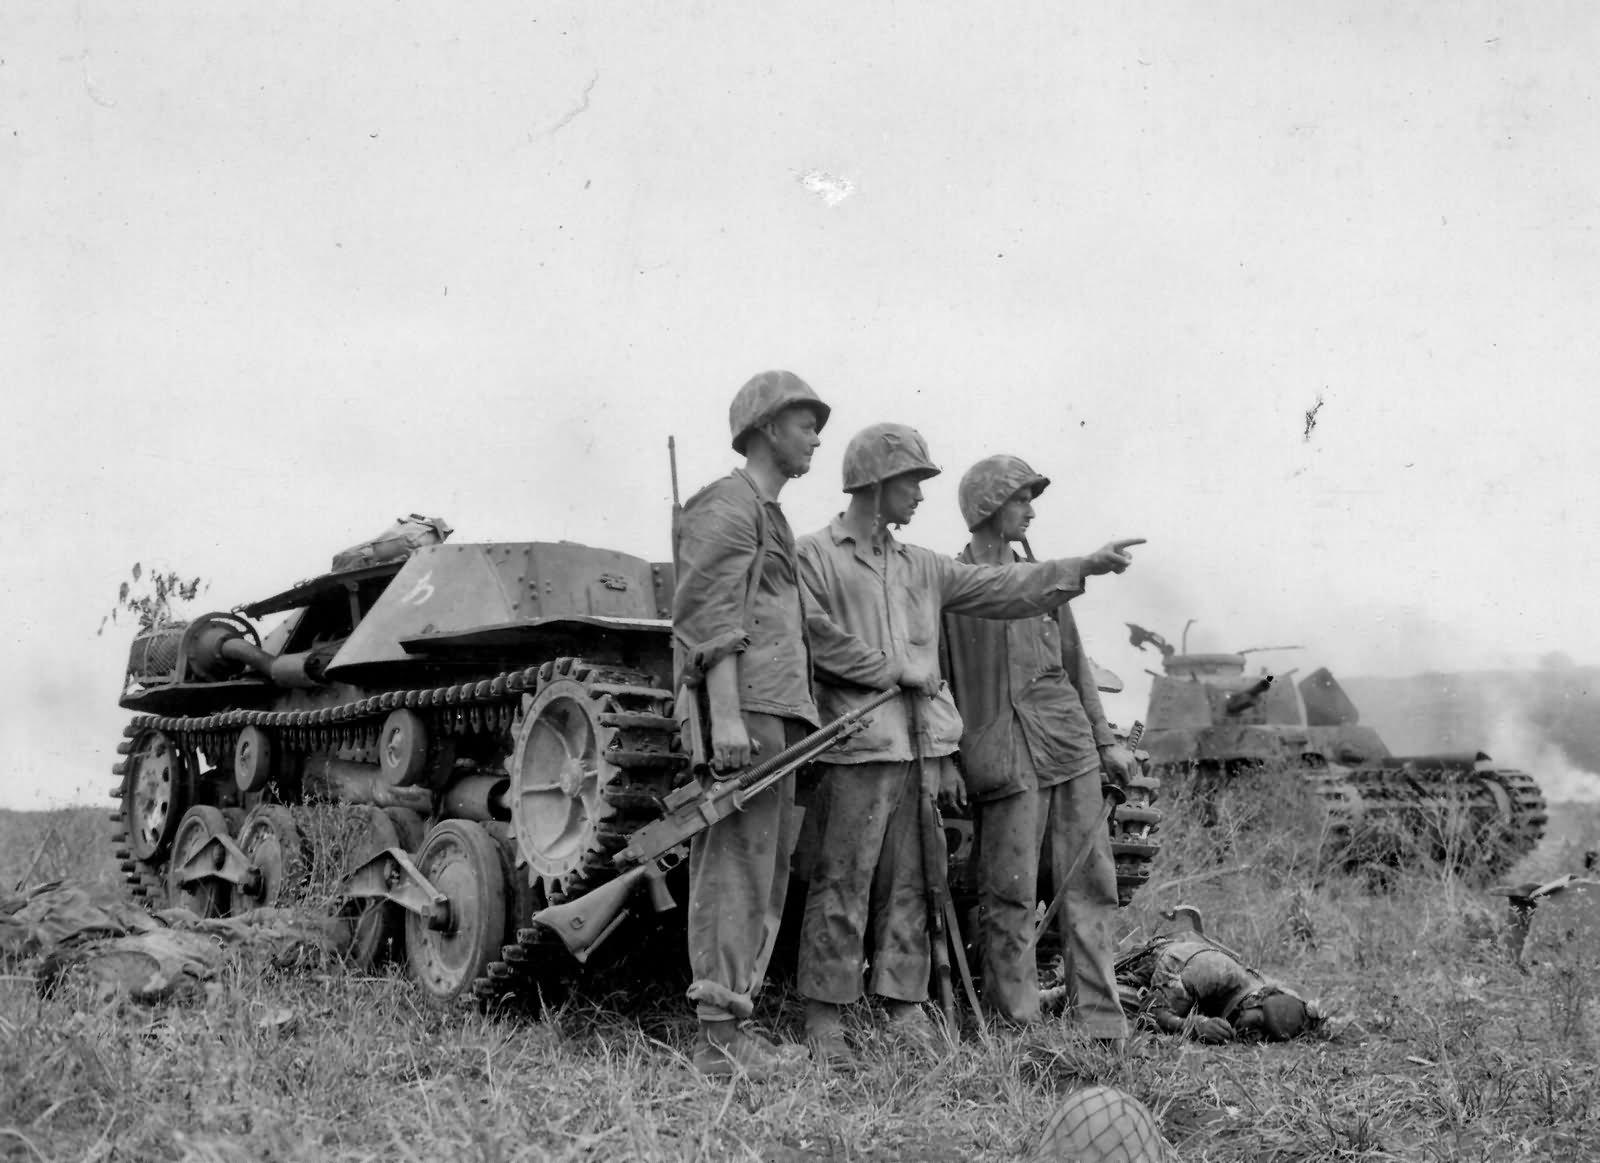 Japanese Type 97 and Type 95 tanks and marines Saipan